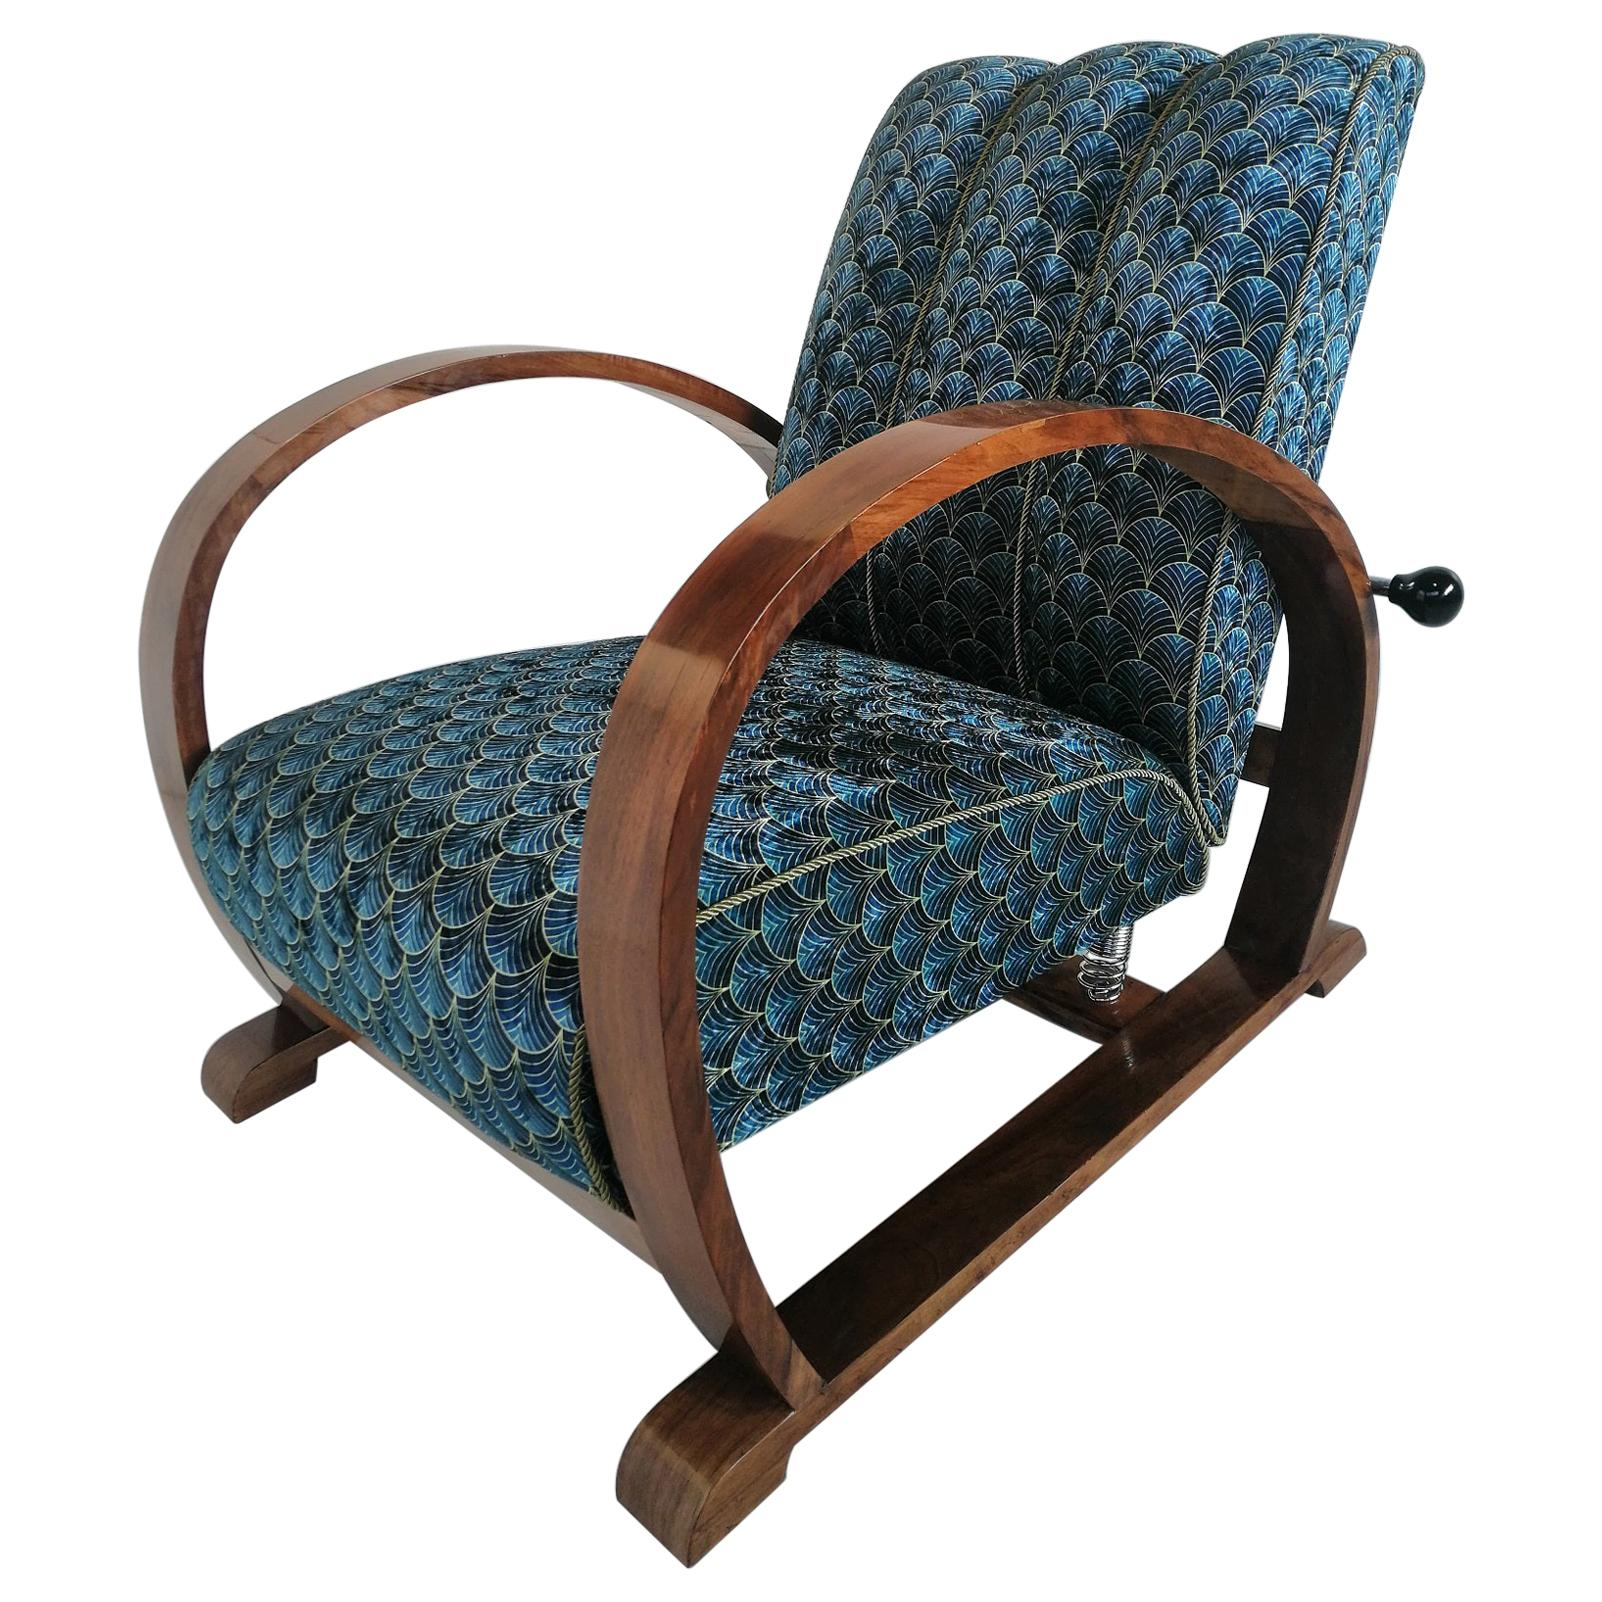 Art Deco Armchair from 1930 Unique